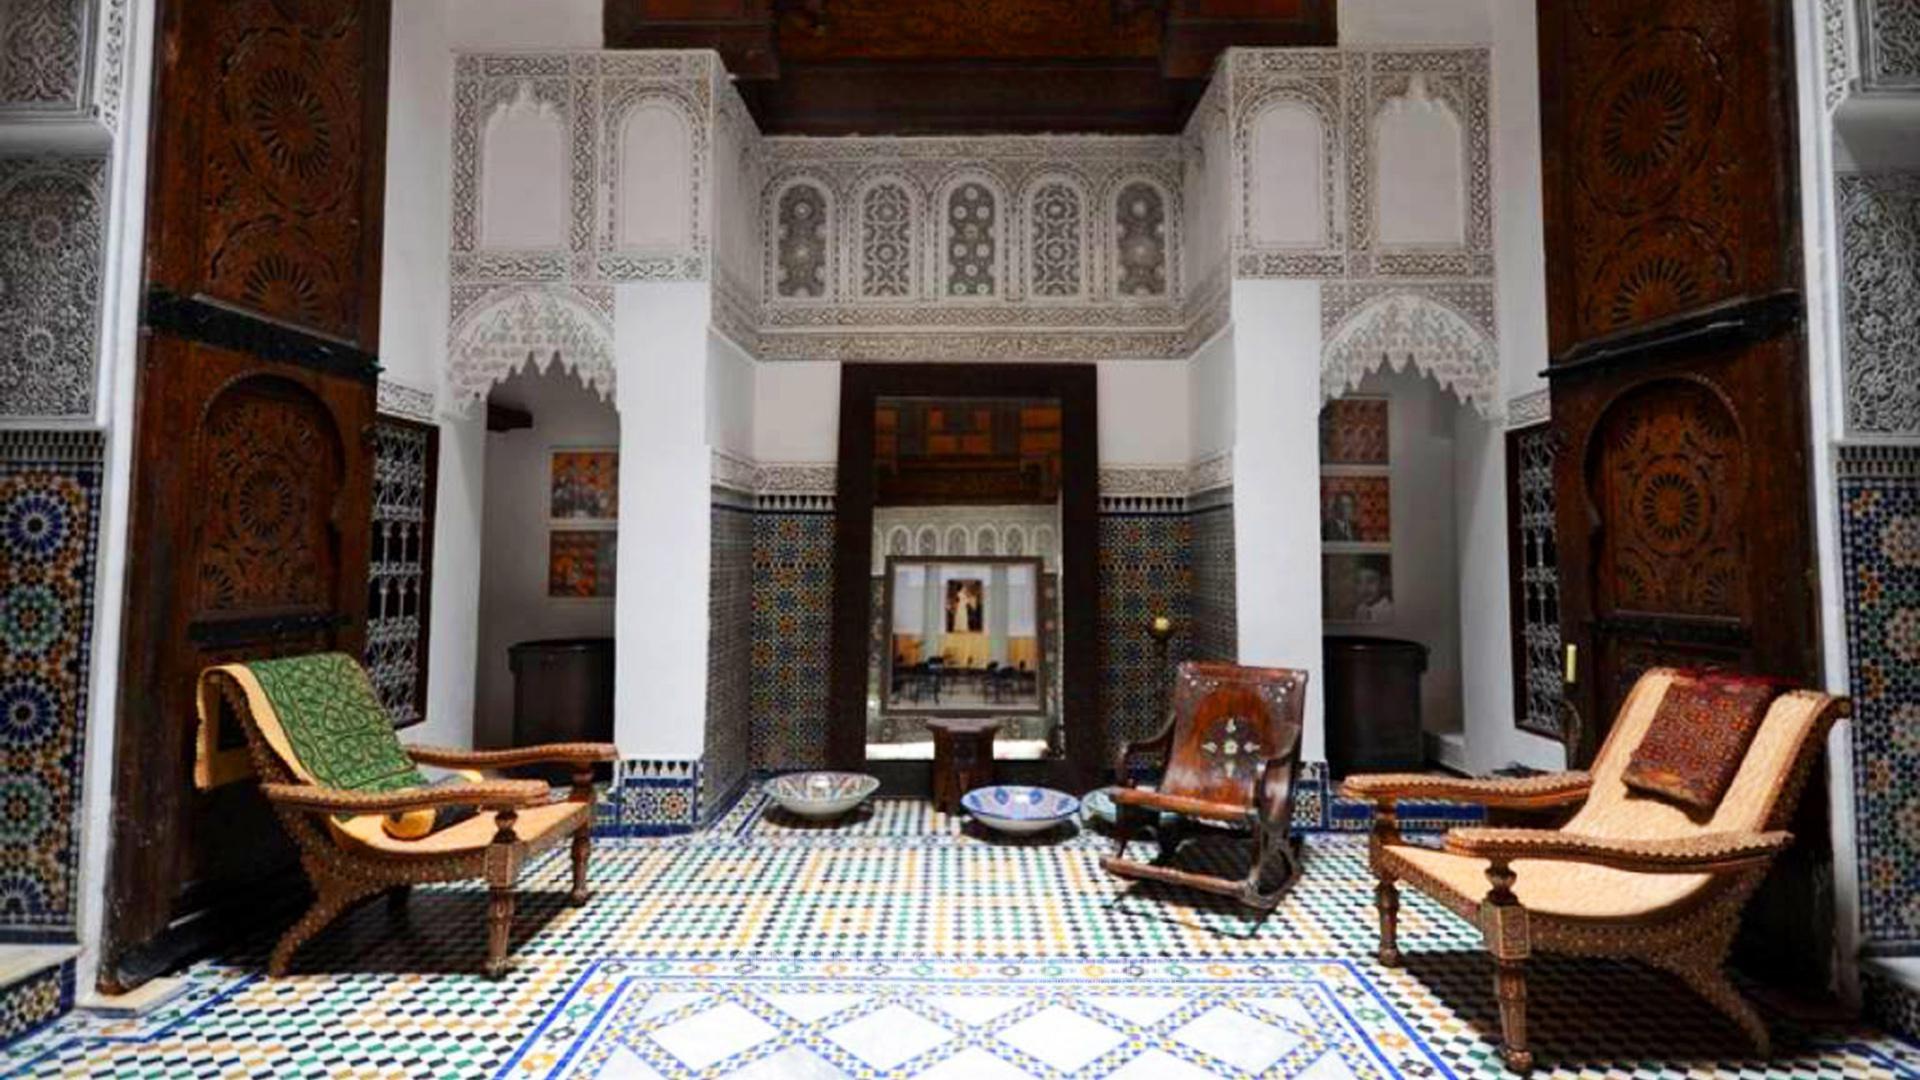 KPPM00538: Riad Fes Riad Fès Maroc